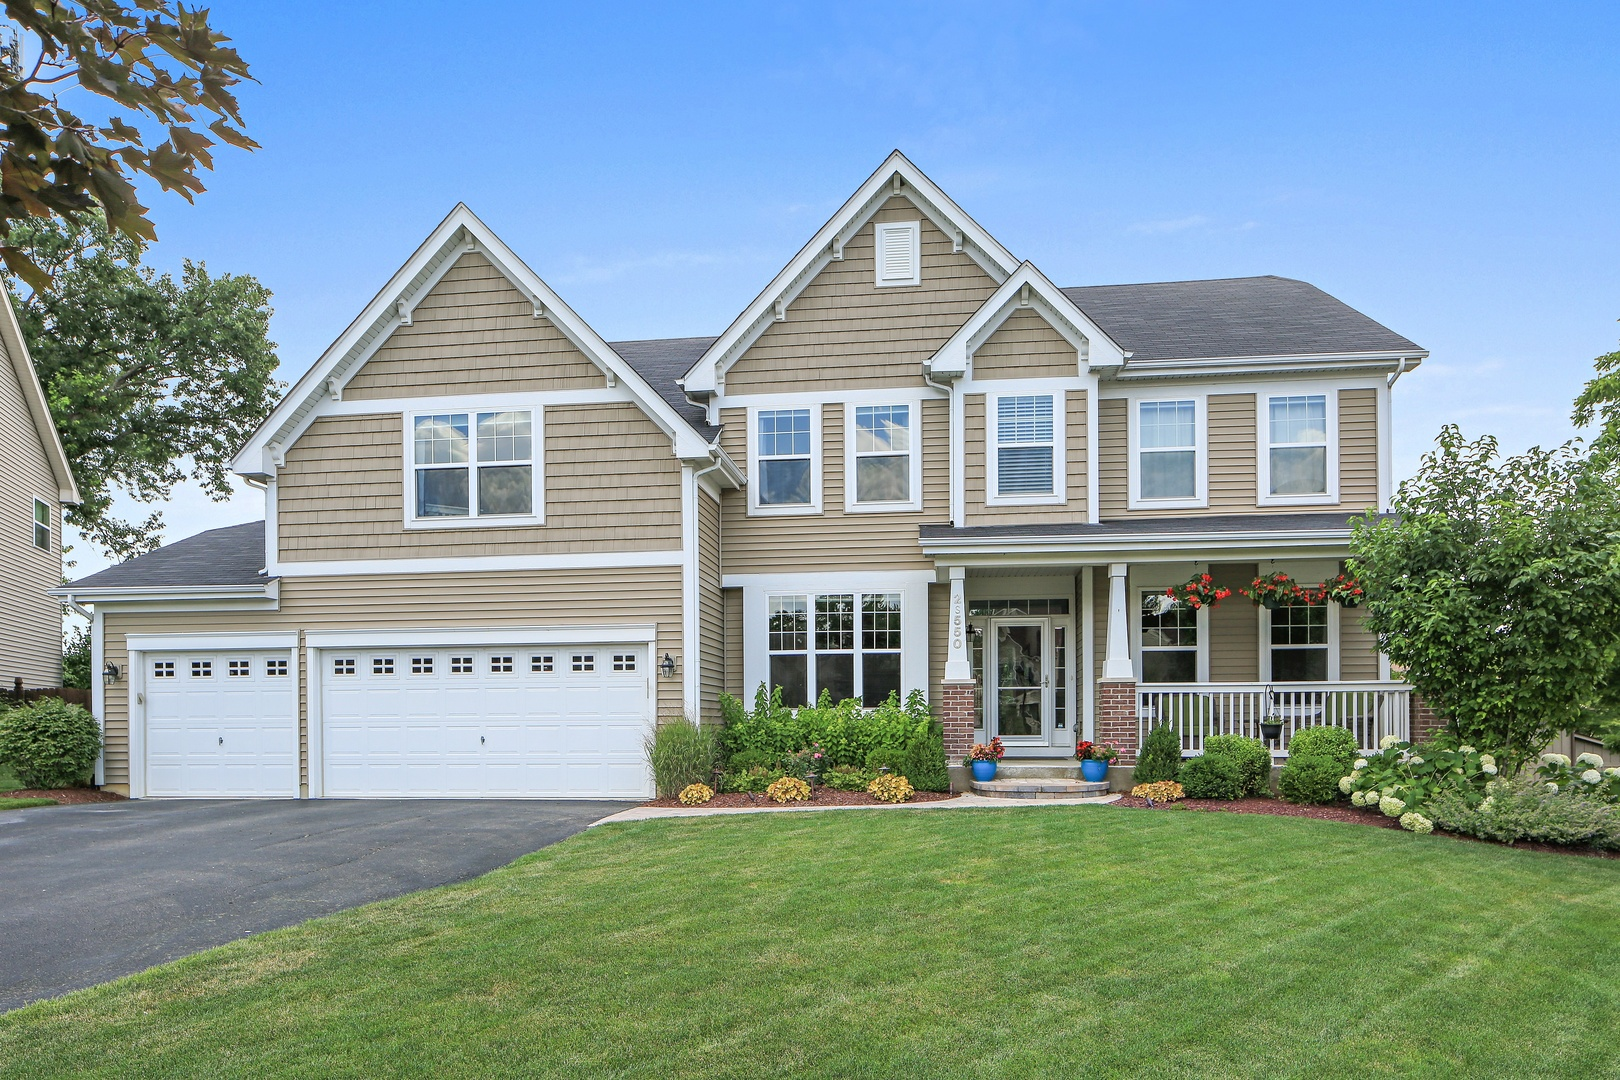 2s550 Maple Terrace, Warrenville, Illinois 60555